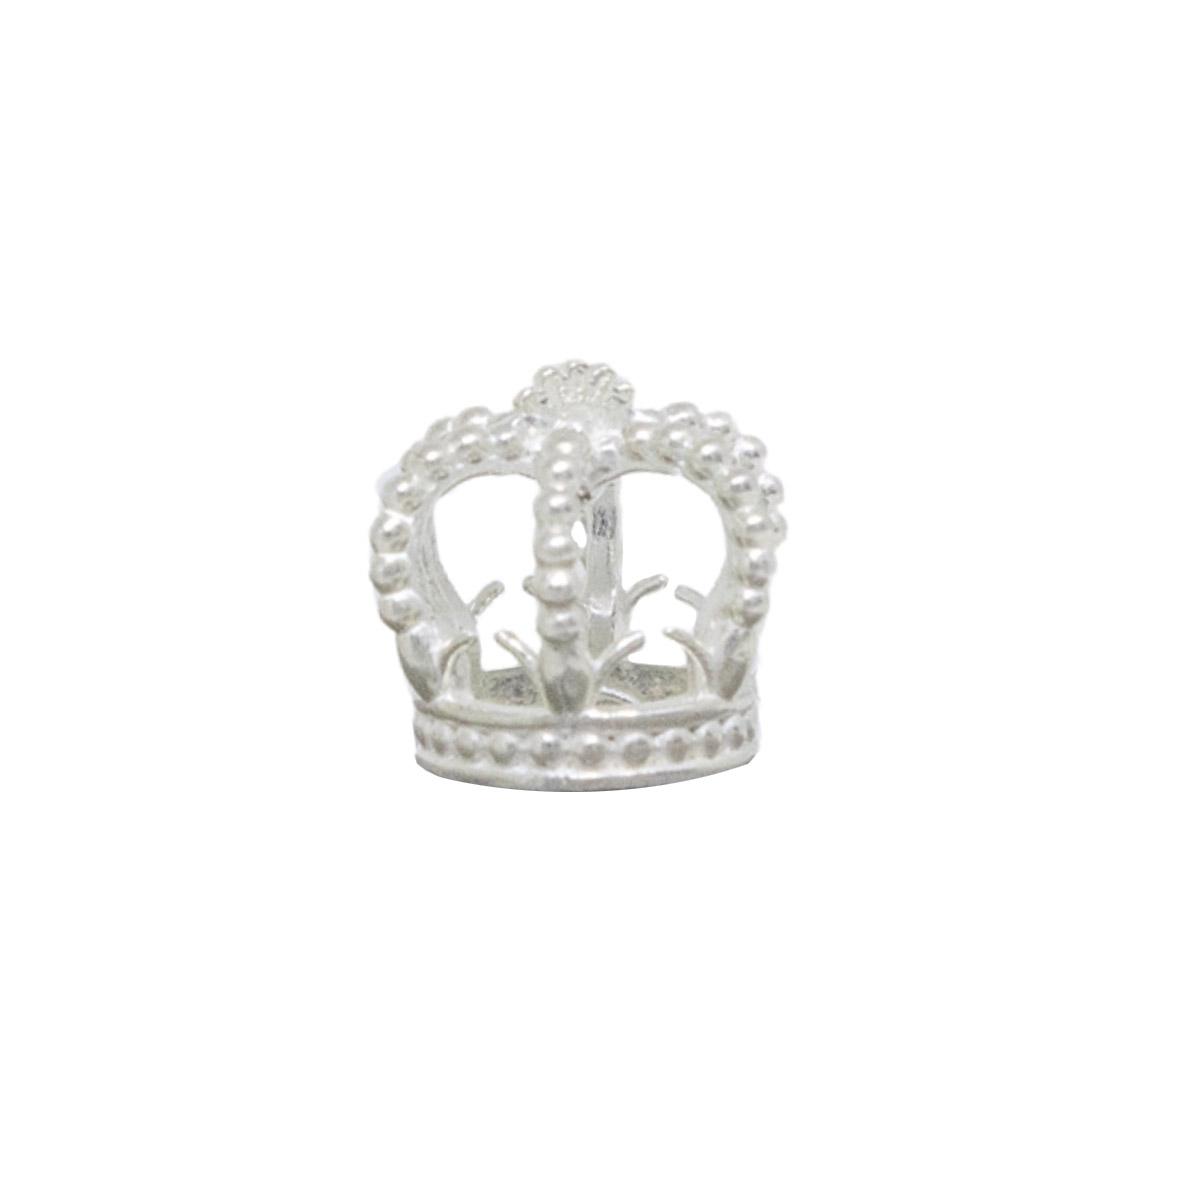 Pingente joia prata de lei 925 maciça coroa hipoalergênica